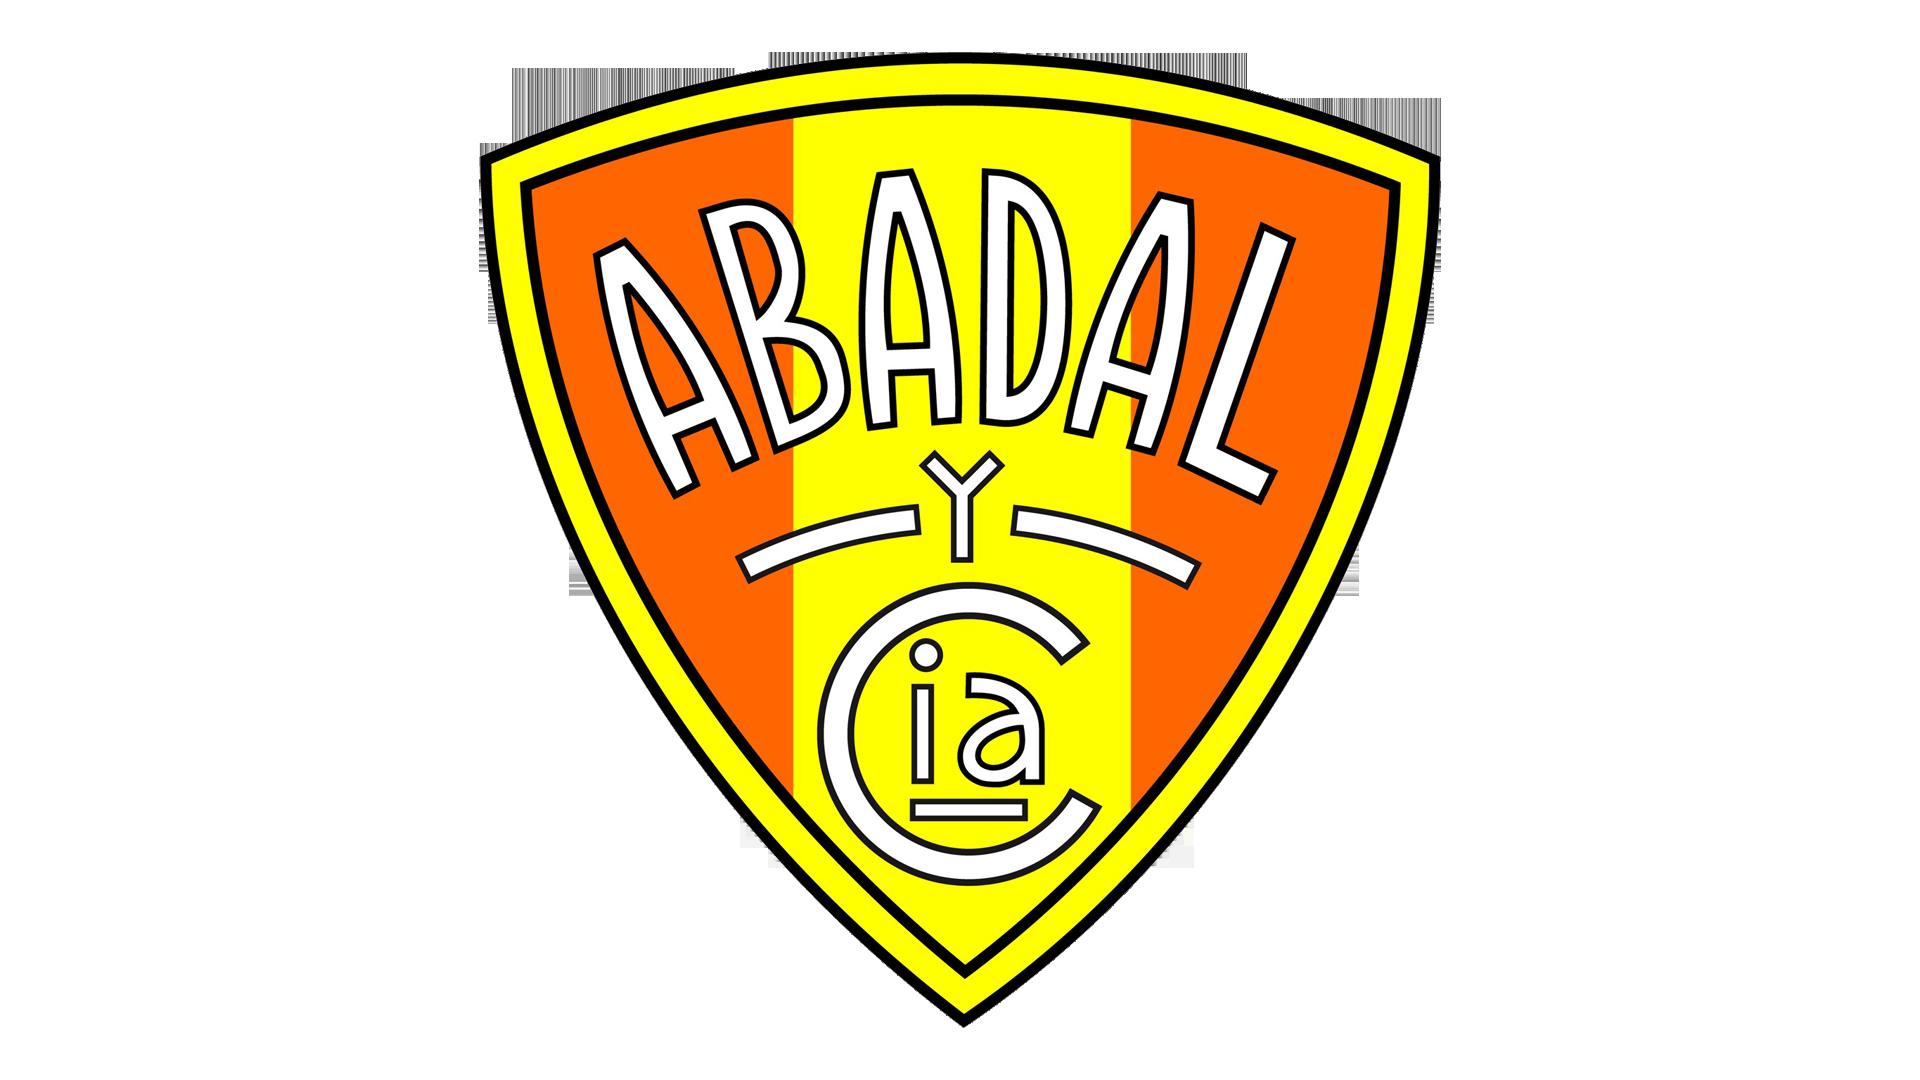 Abadal Logo, HD Png, I...